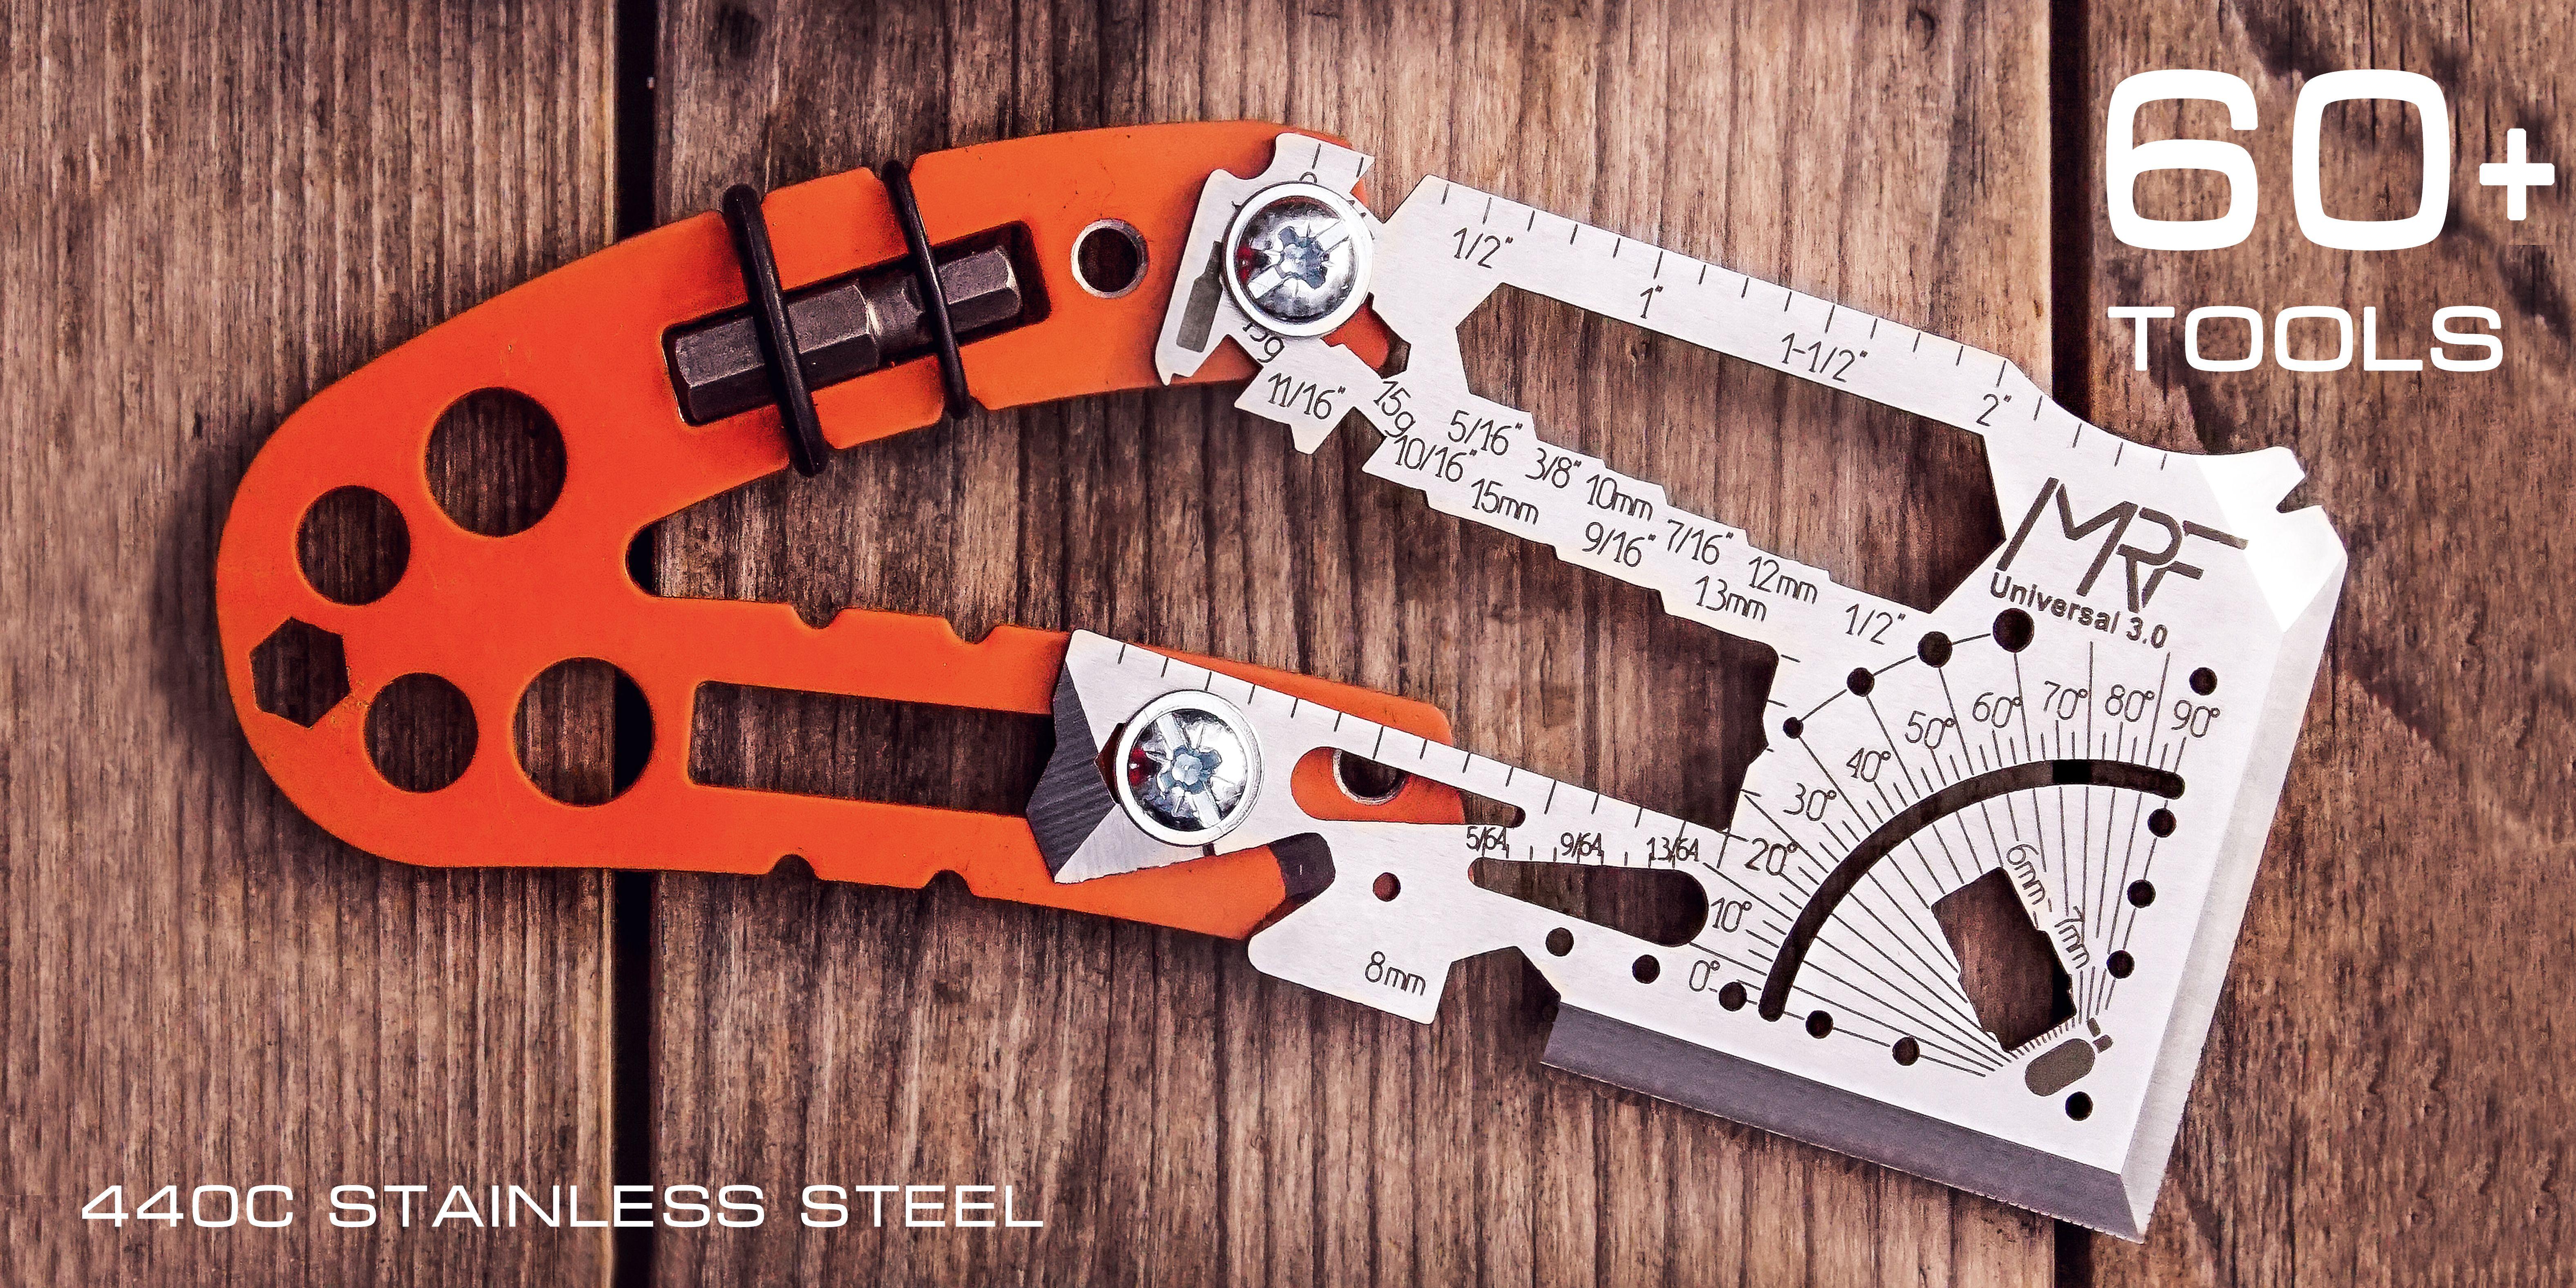 Universal 3 0 60 Tools